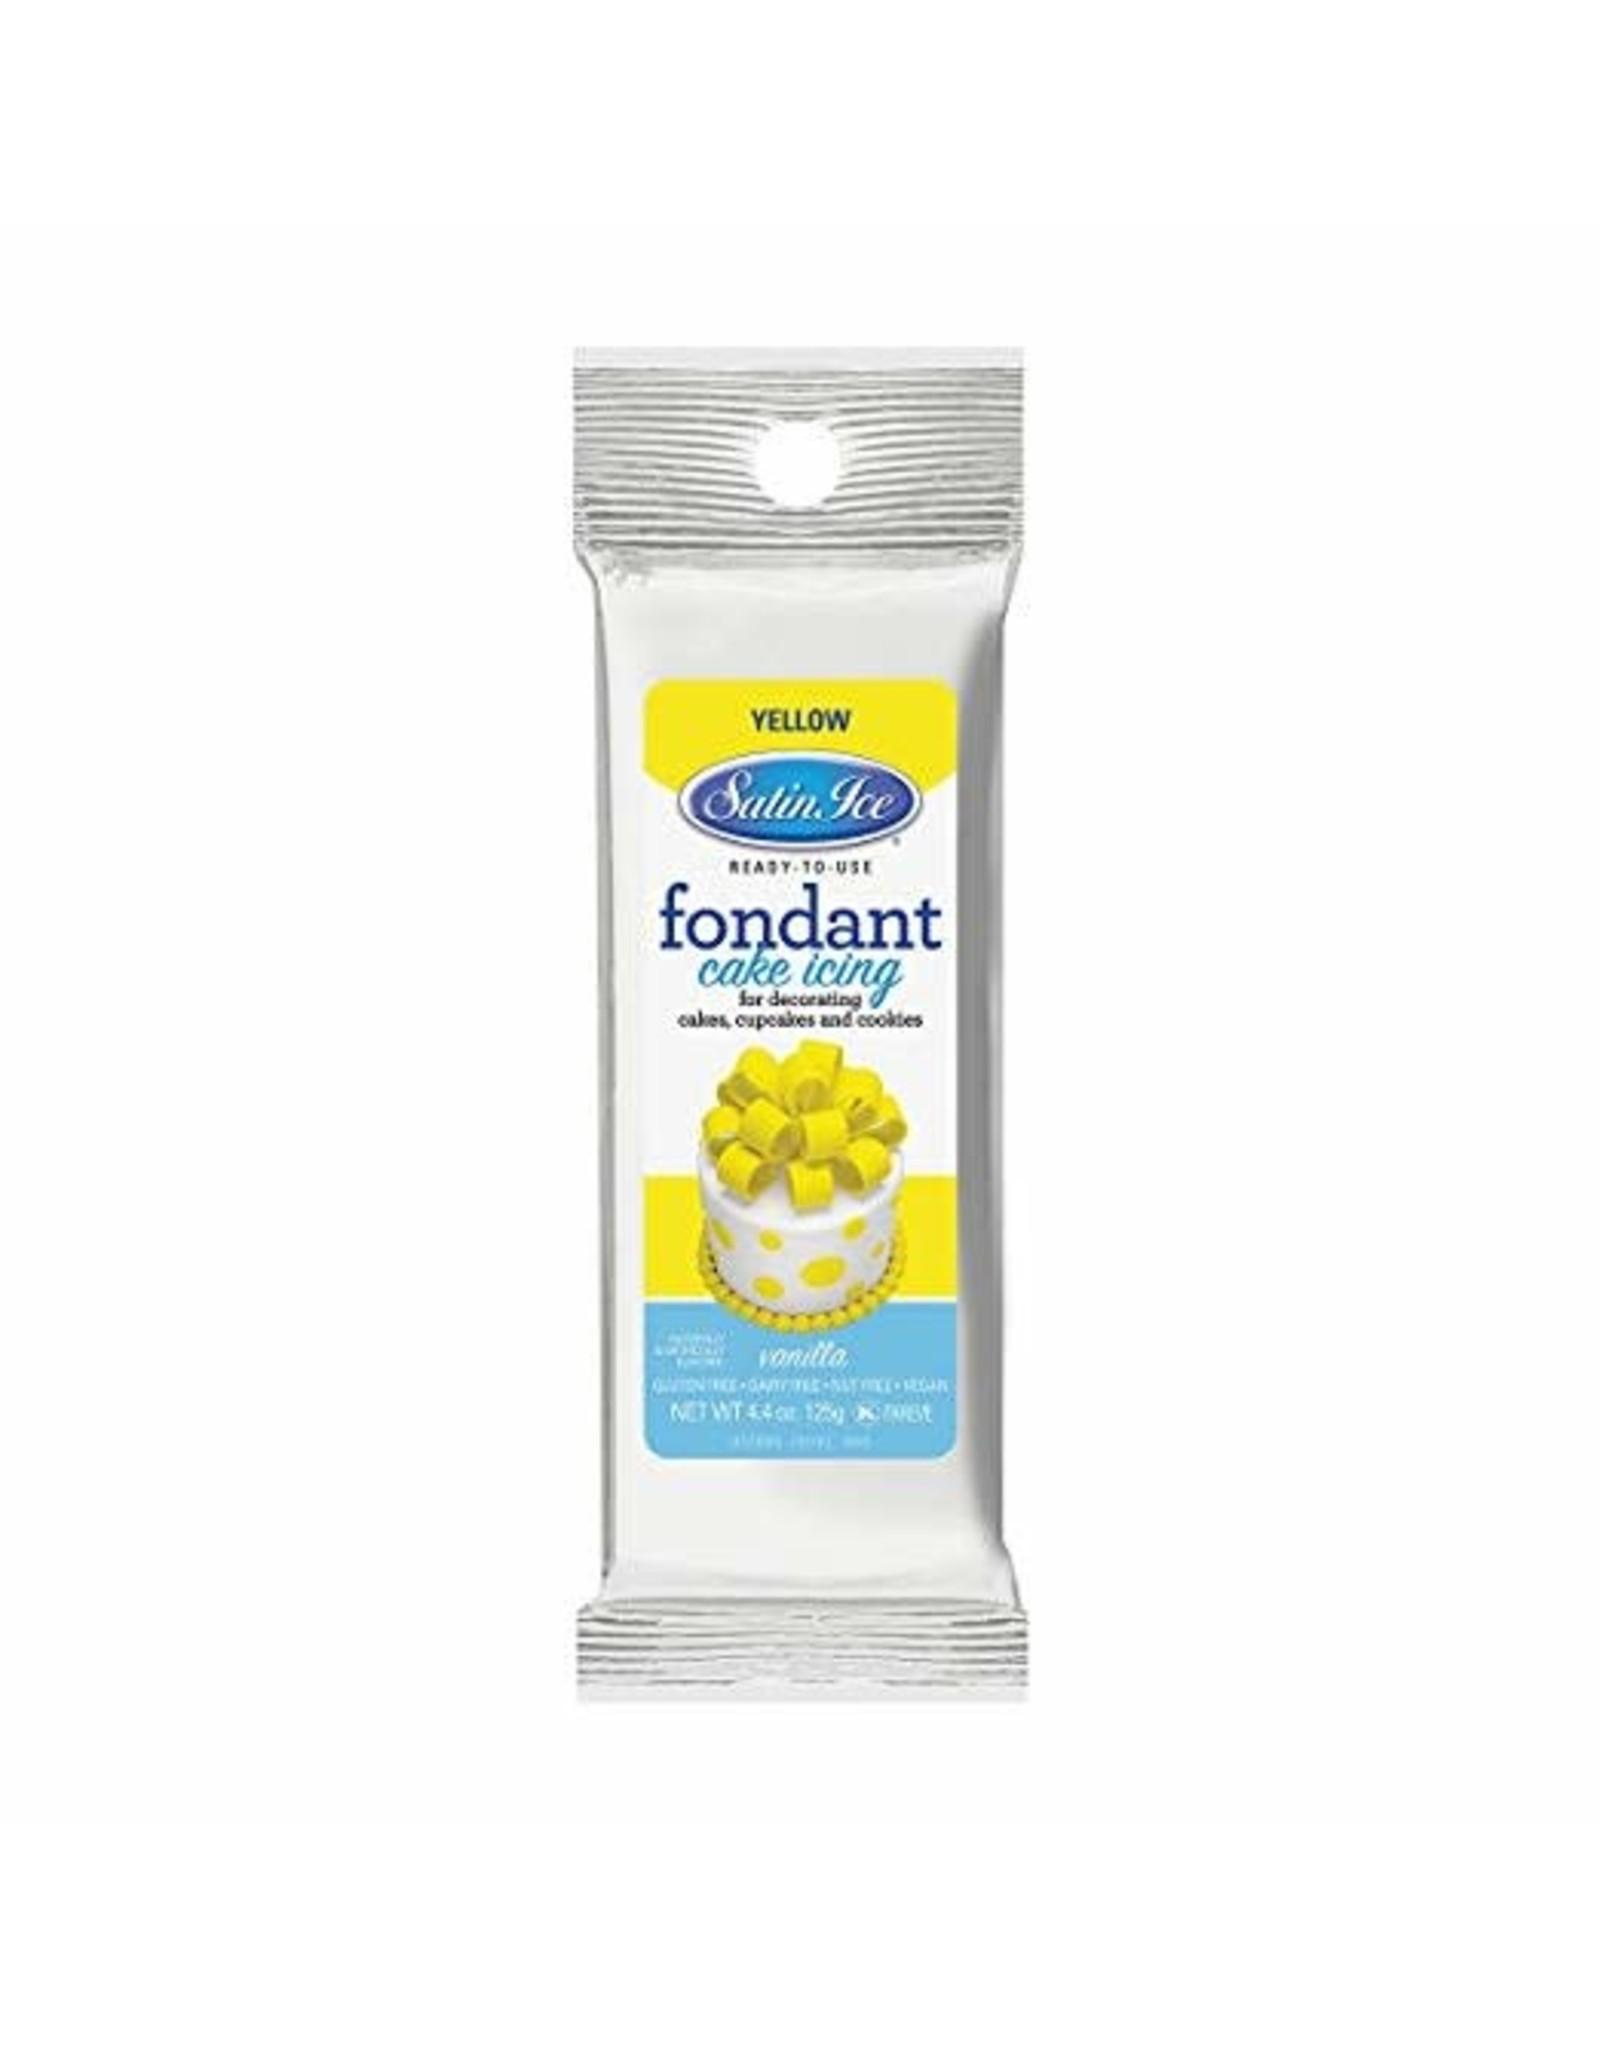 Satin Ice 4.04oz Yellow Fondant